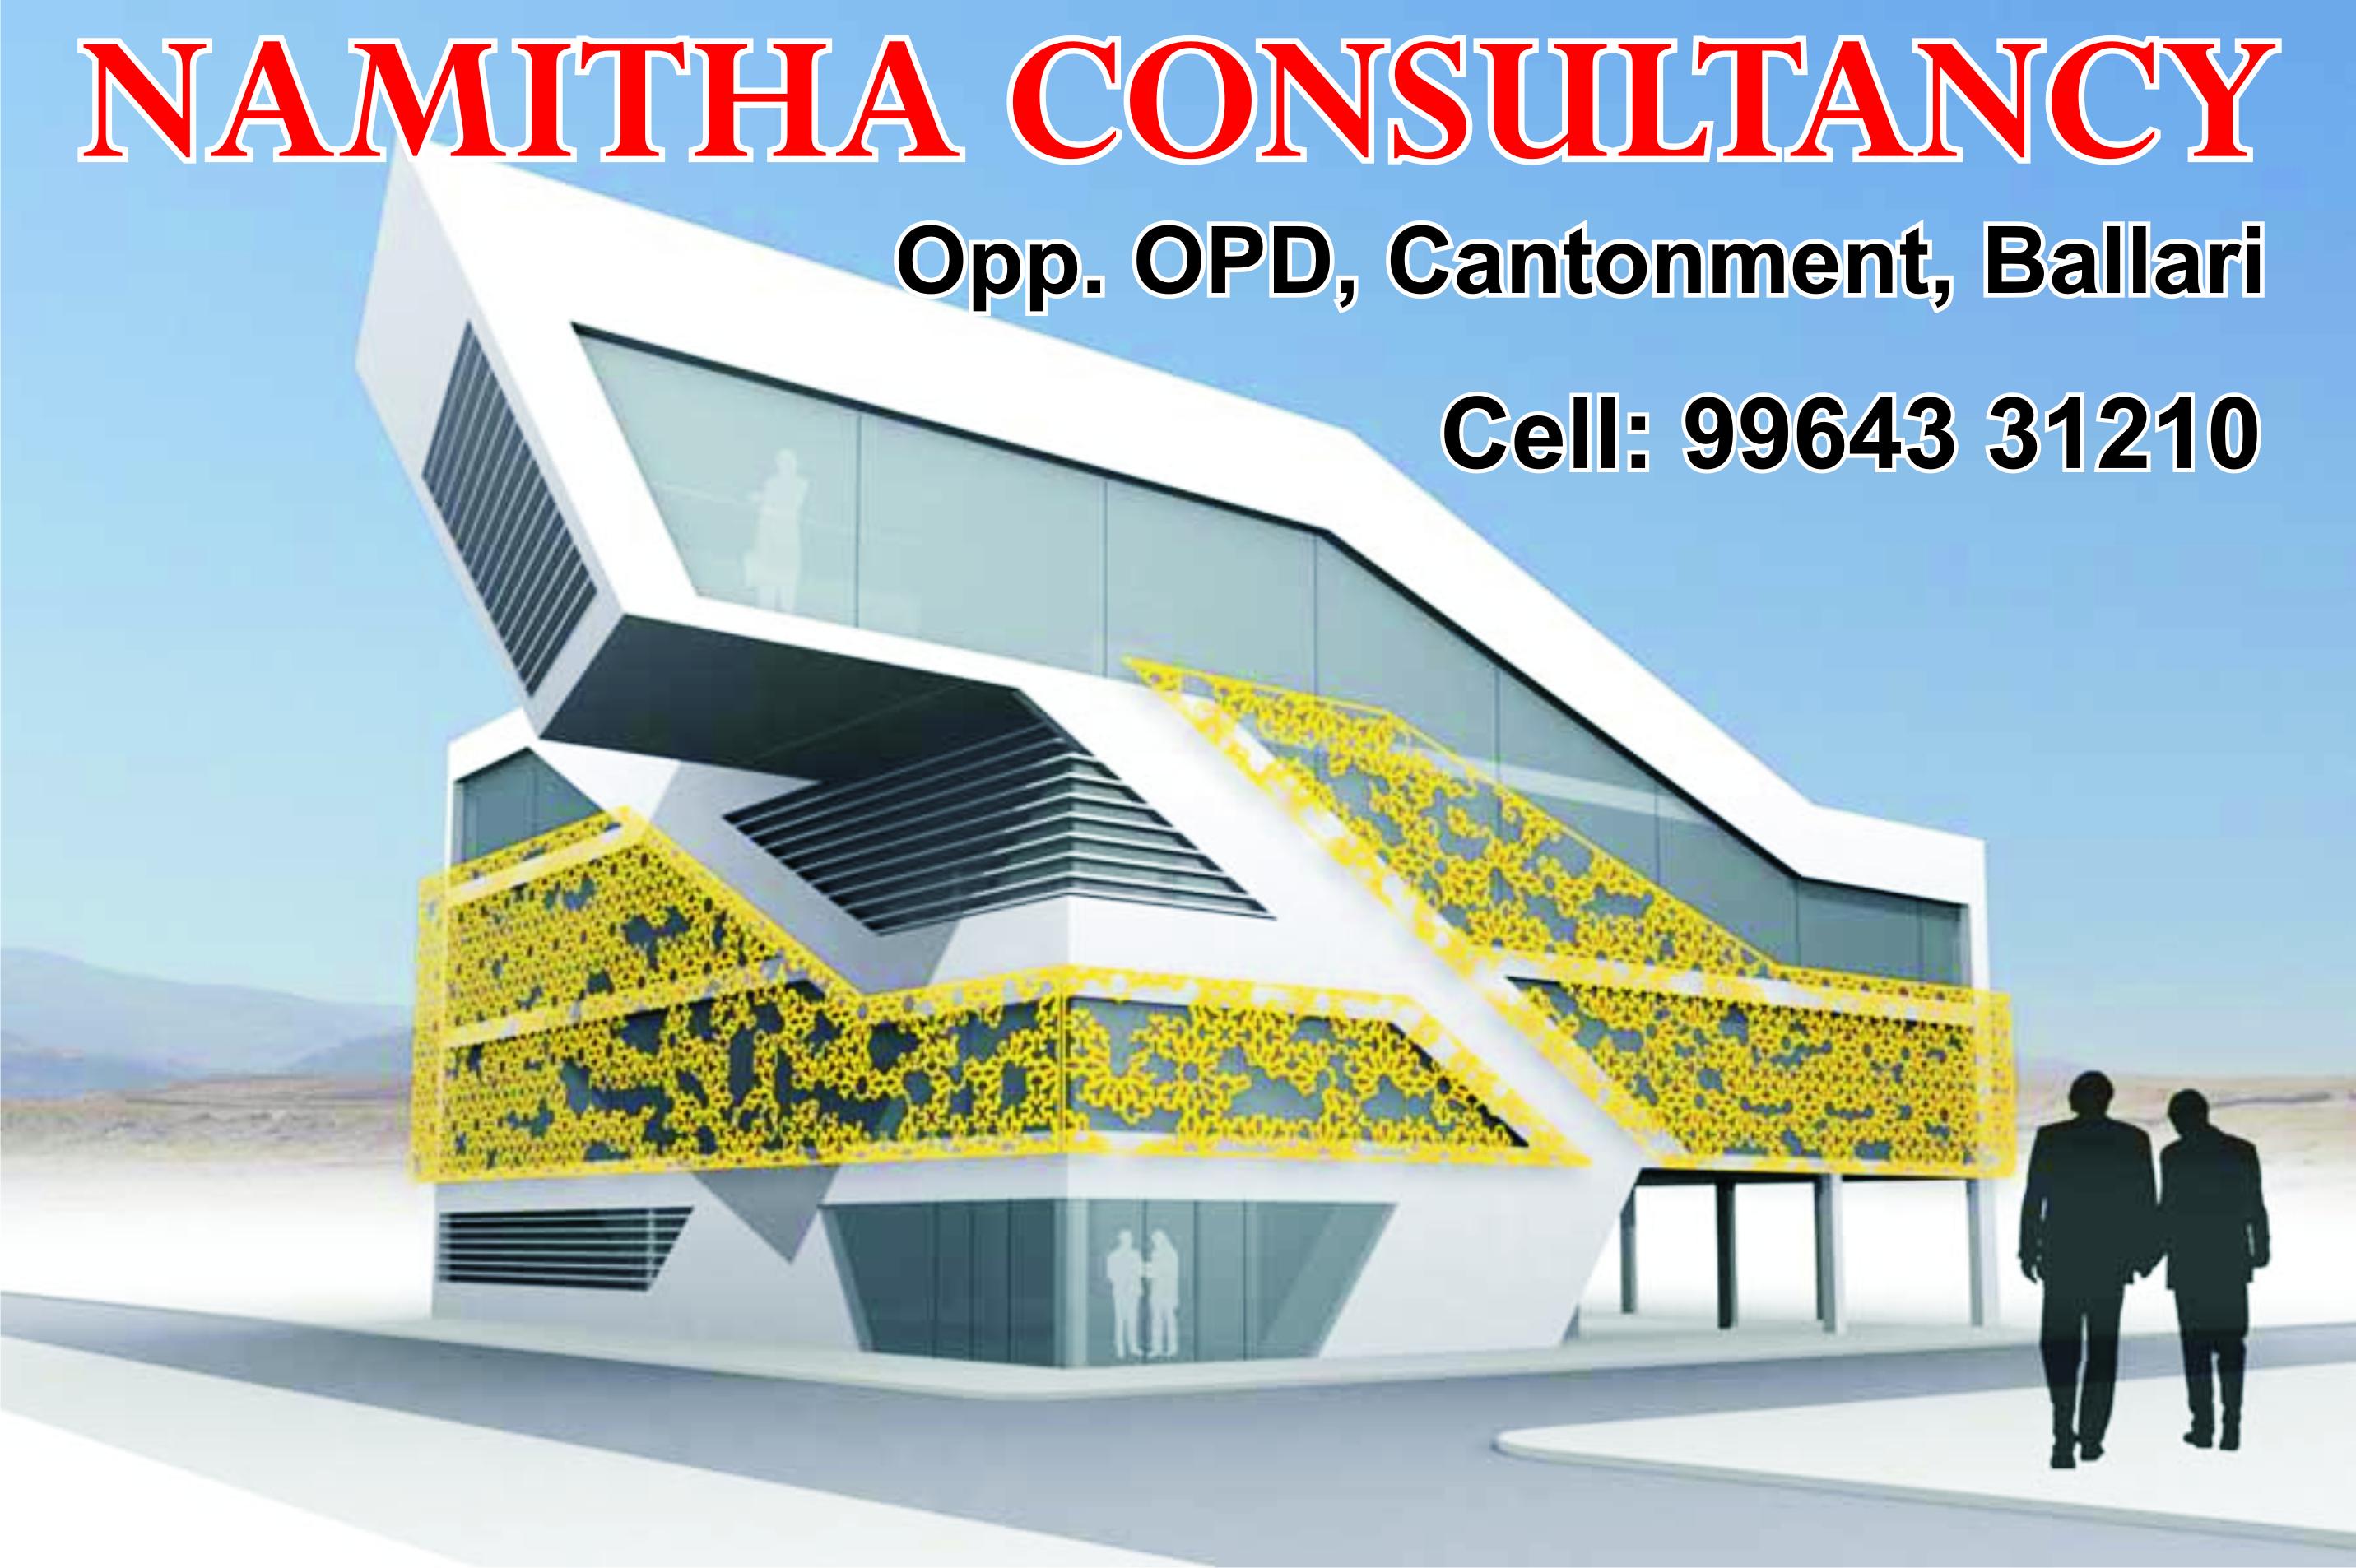 Namitha Consultancy